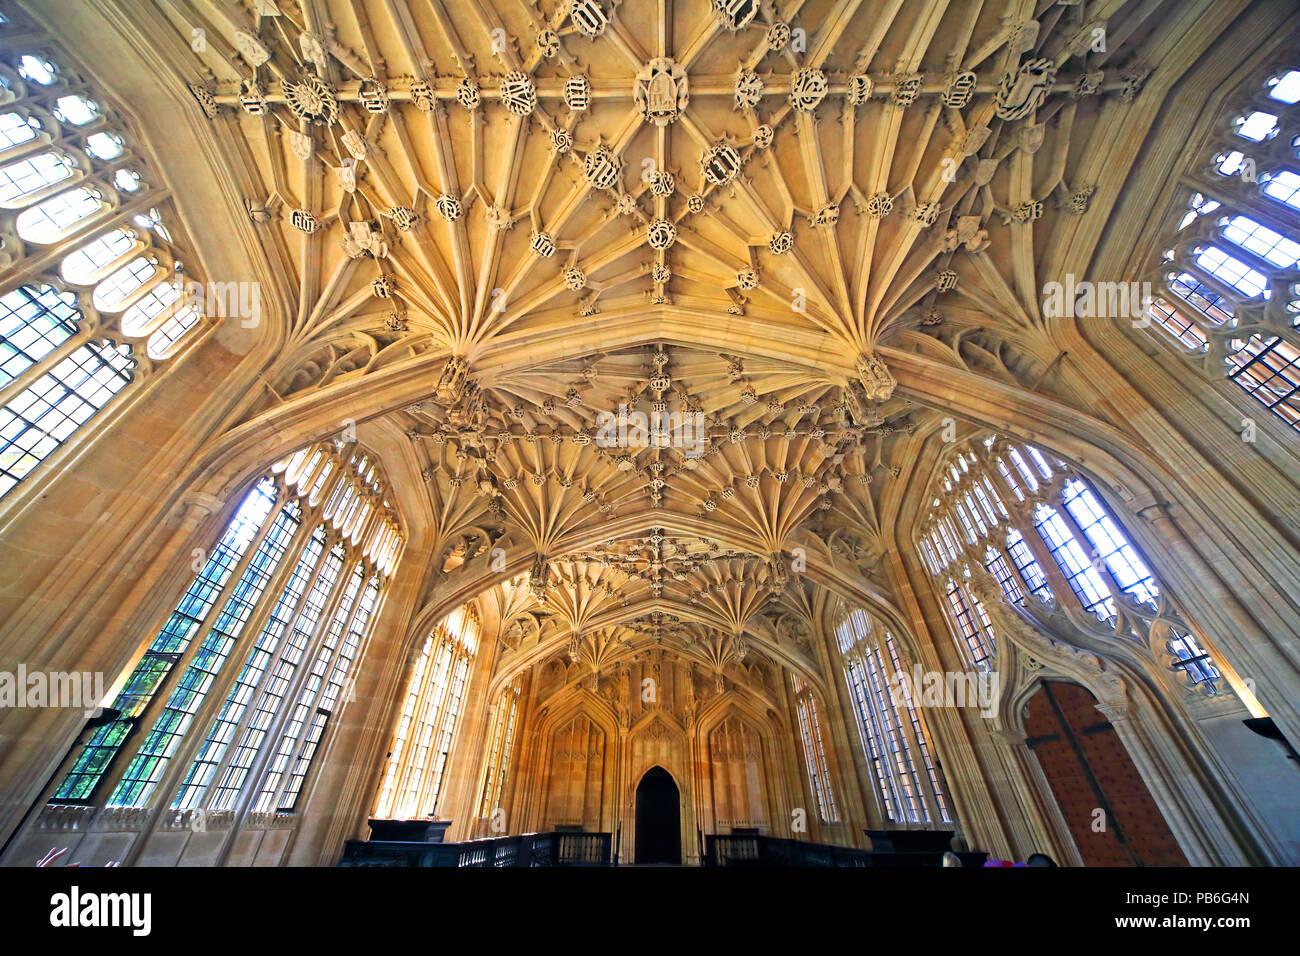 @HotpixUK,GoTonySmith,divinity,school,UK,stonework,building,interior,inside,libraries,learning,Perpendicular